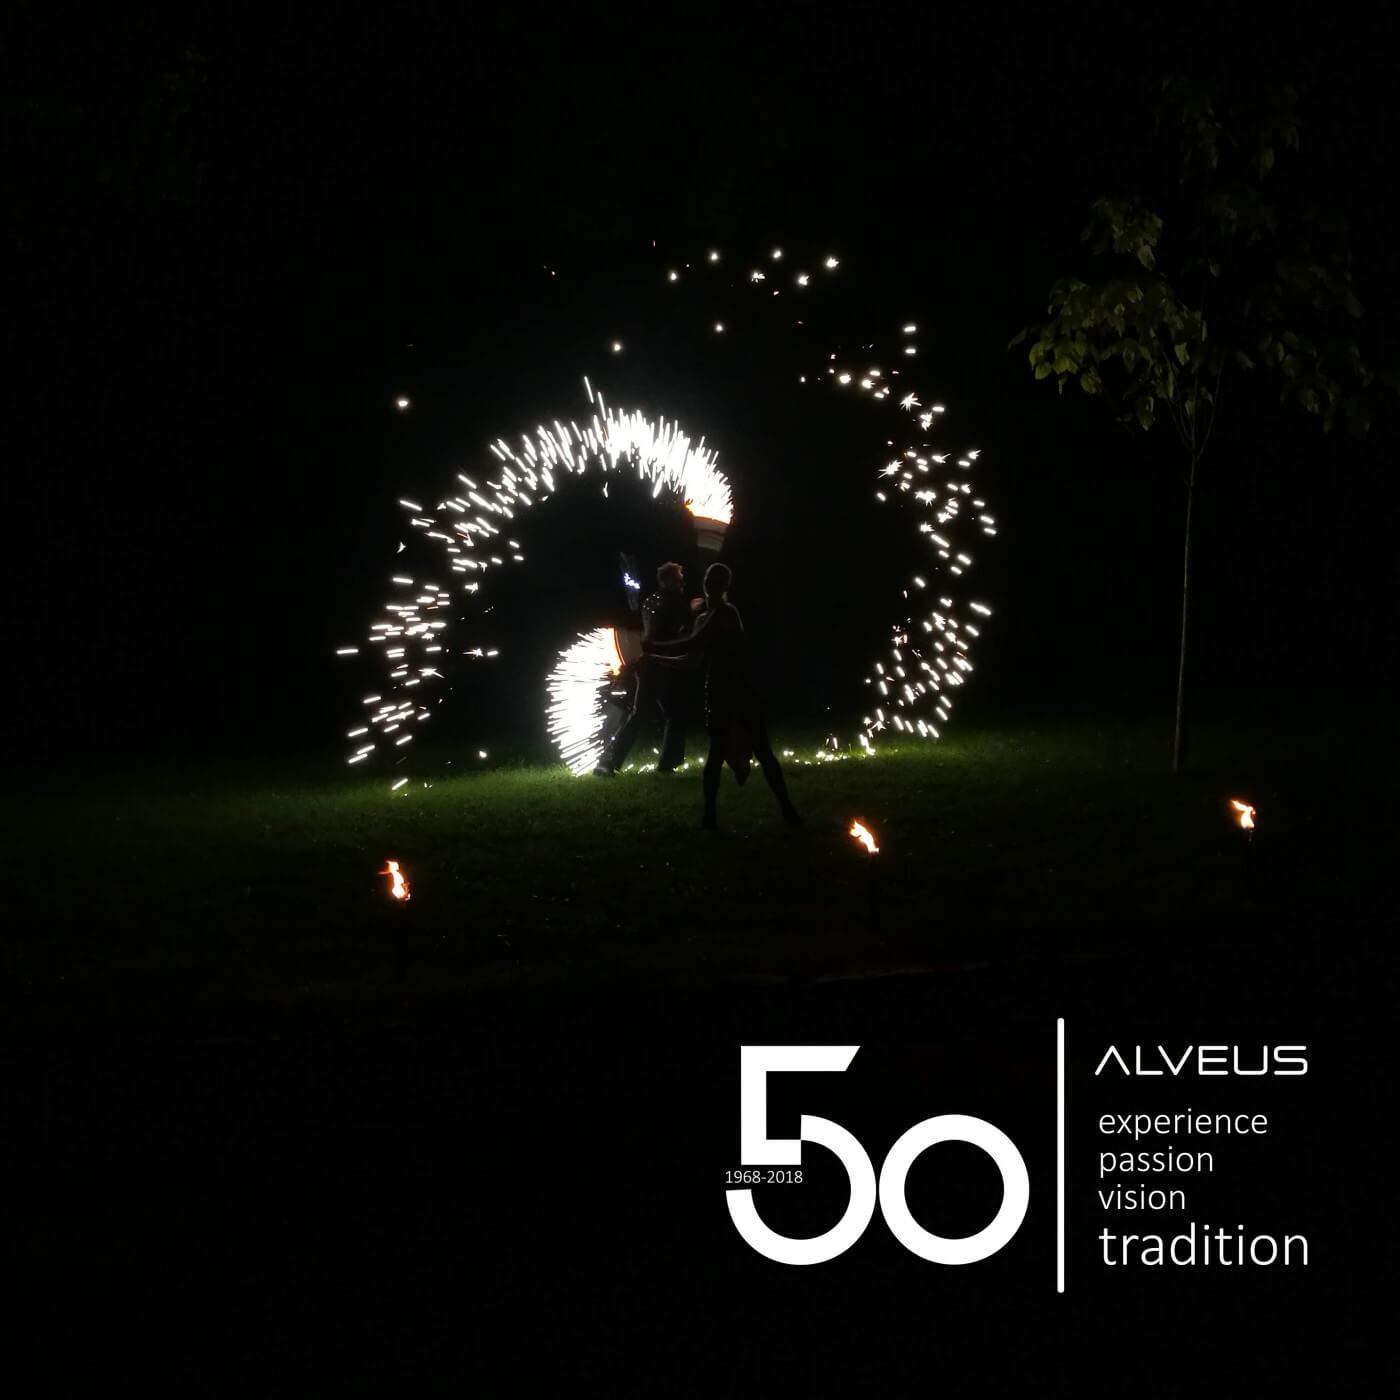 50 років Alveus